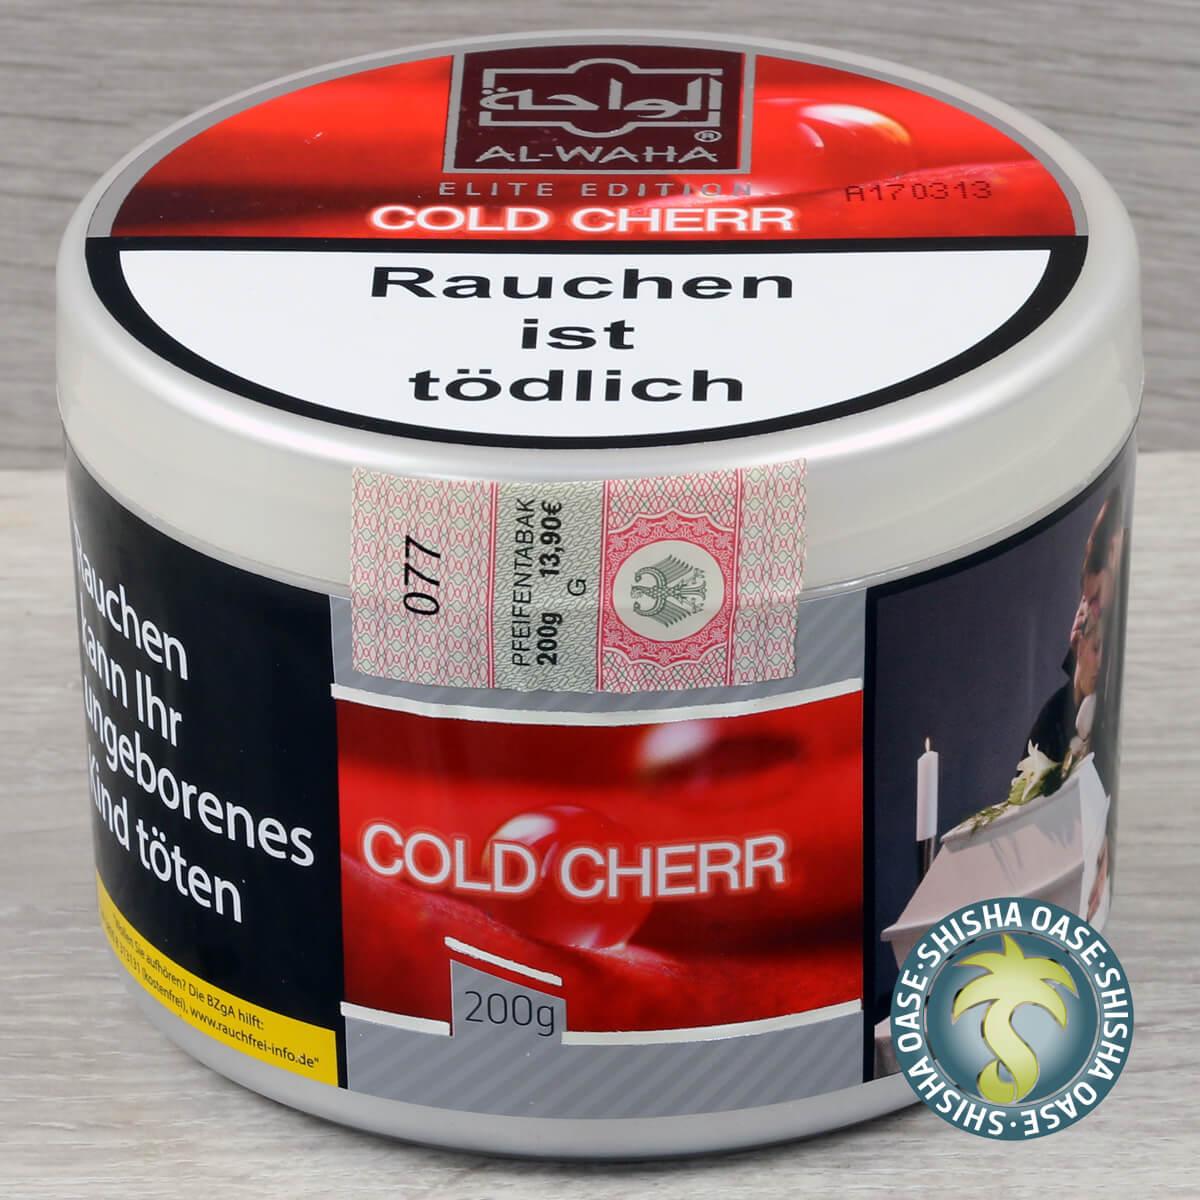 Al Waha Cold Cherr 200g Dose - rauchfertig